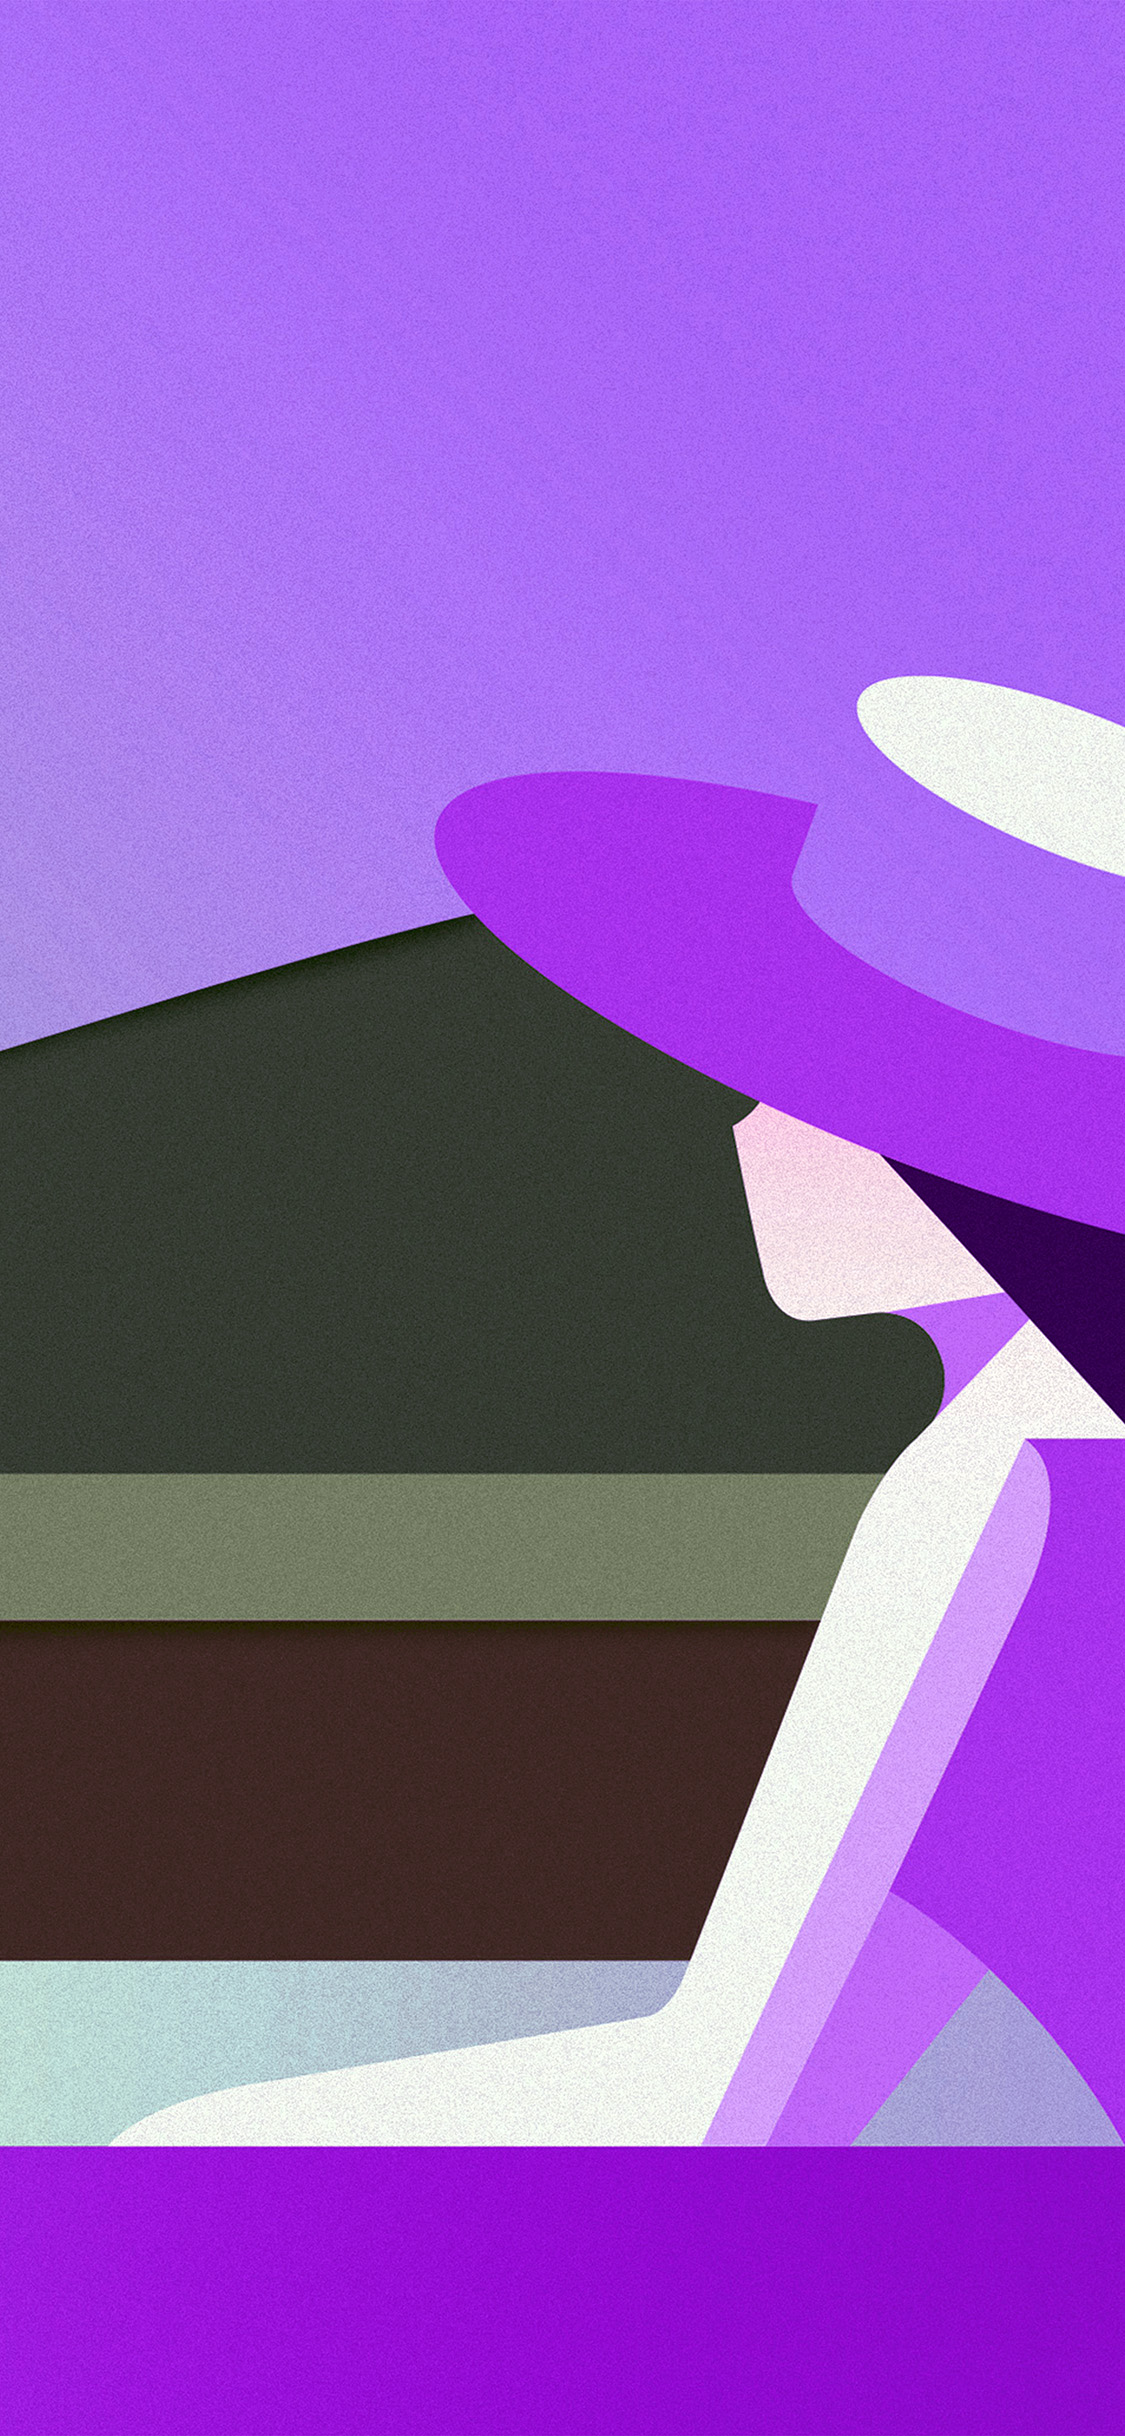 iPhonexpapers.com-Apple-iPhone-wallpaper-bd33-minimal-simple-digital-woman-art-illustration-purple